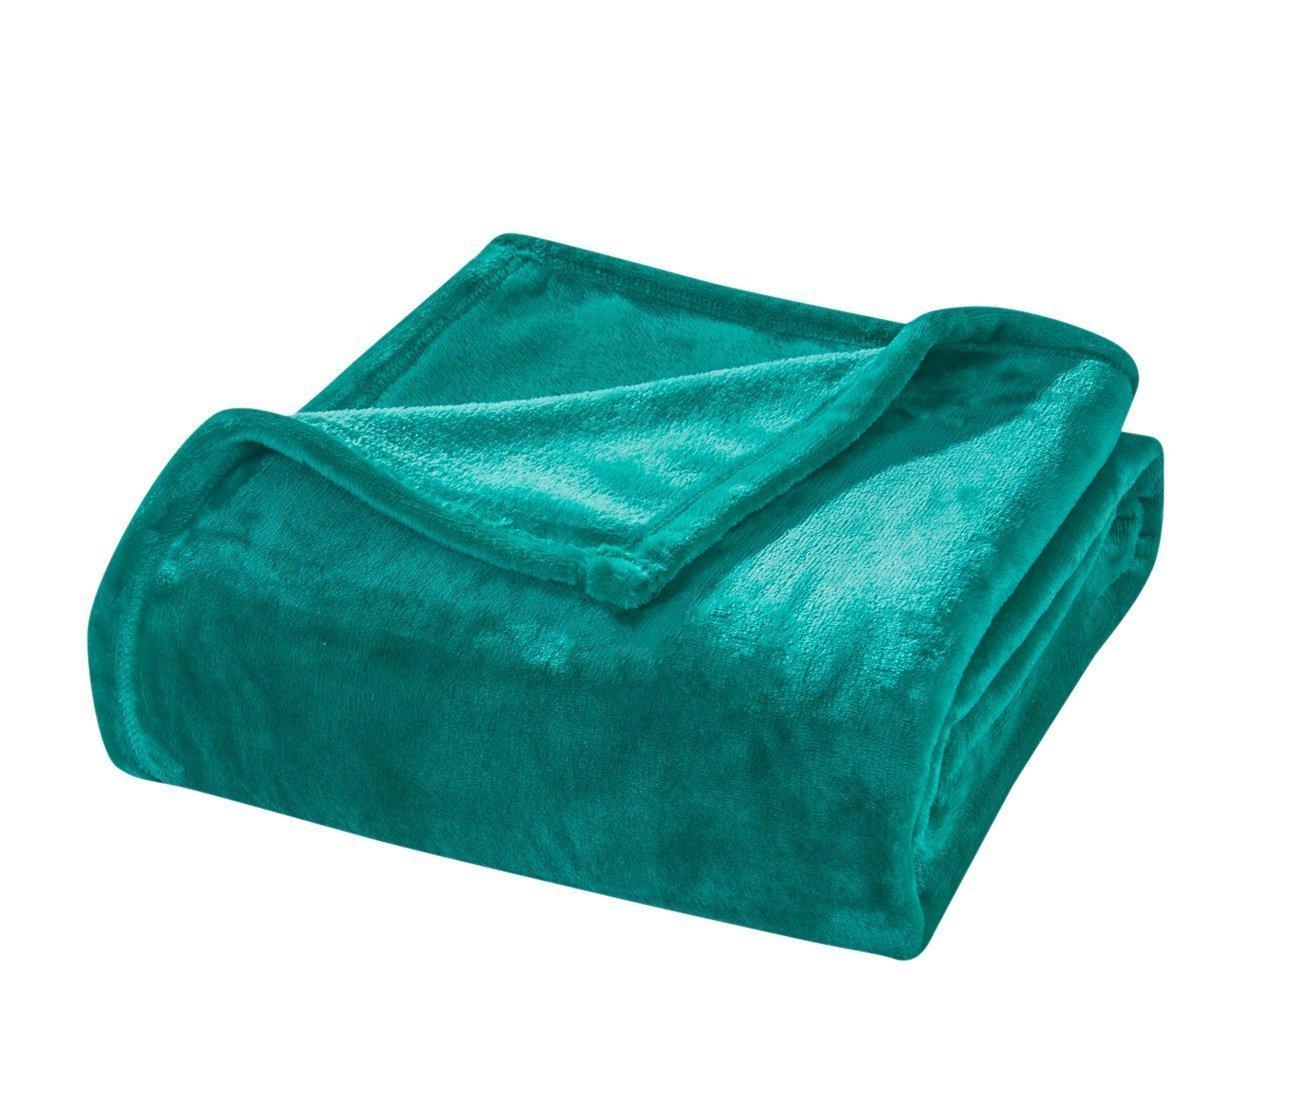 Honeymoon Velvet Flannel Fleece Throw Lightweight Cozy Plush Microfiber Blanket, Teal